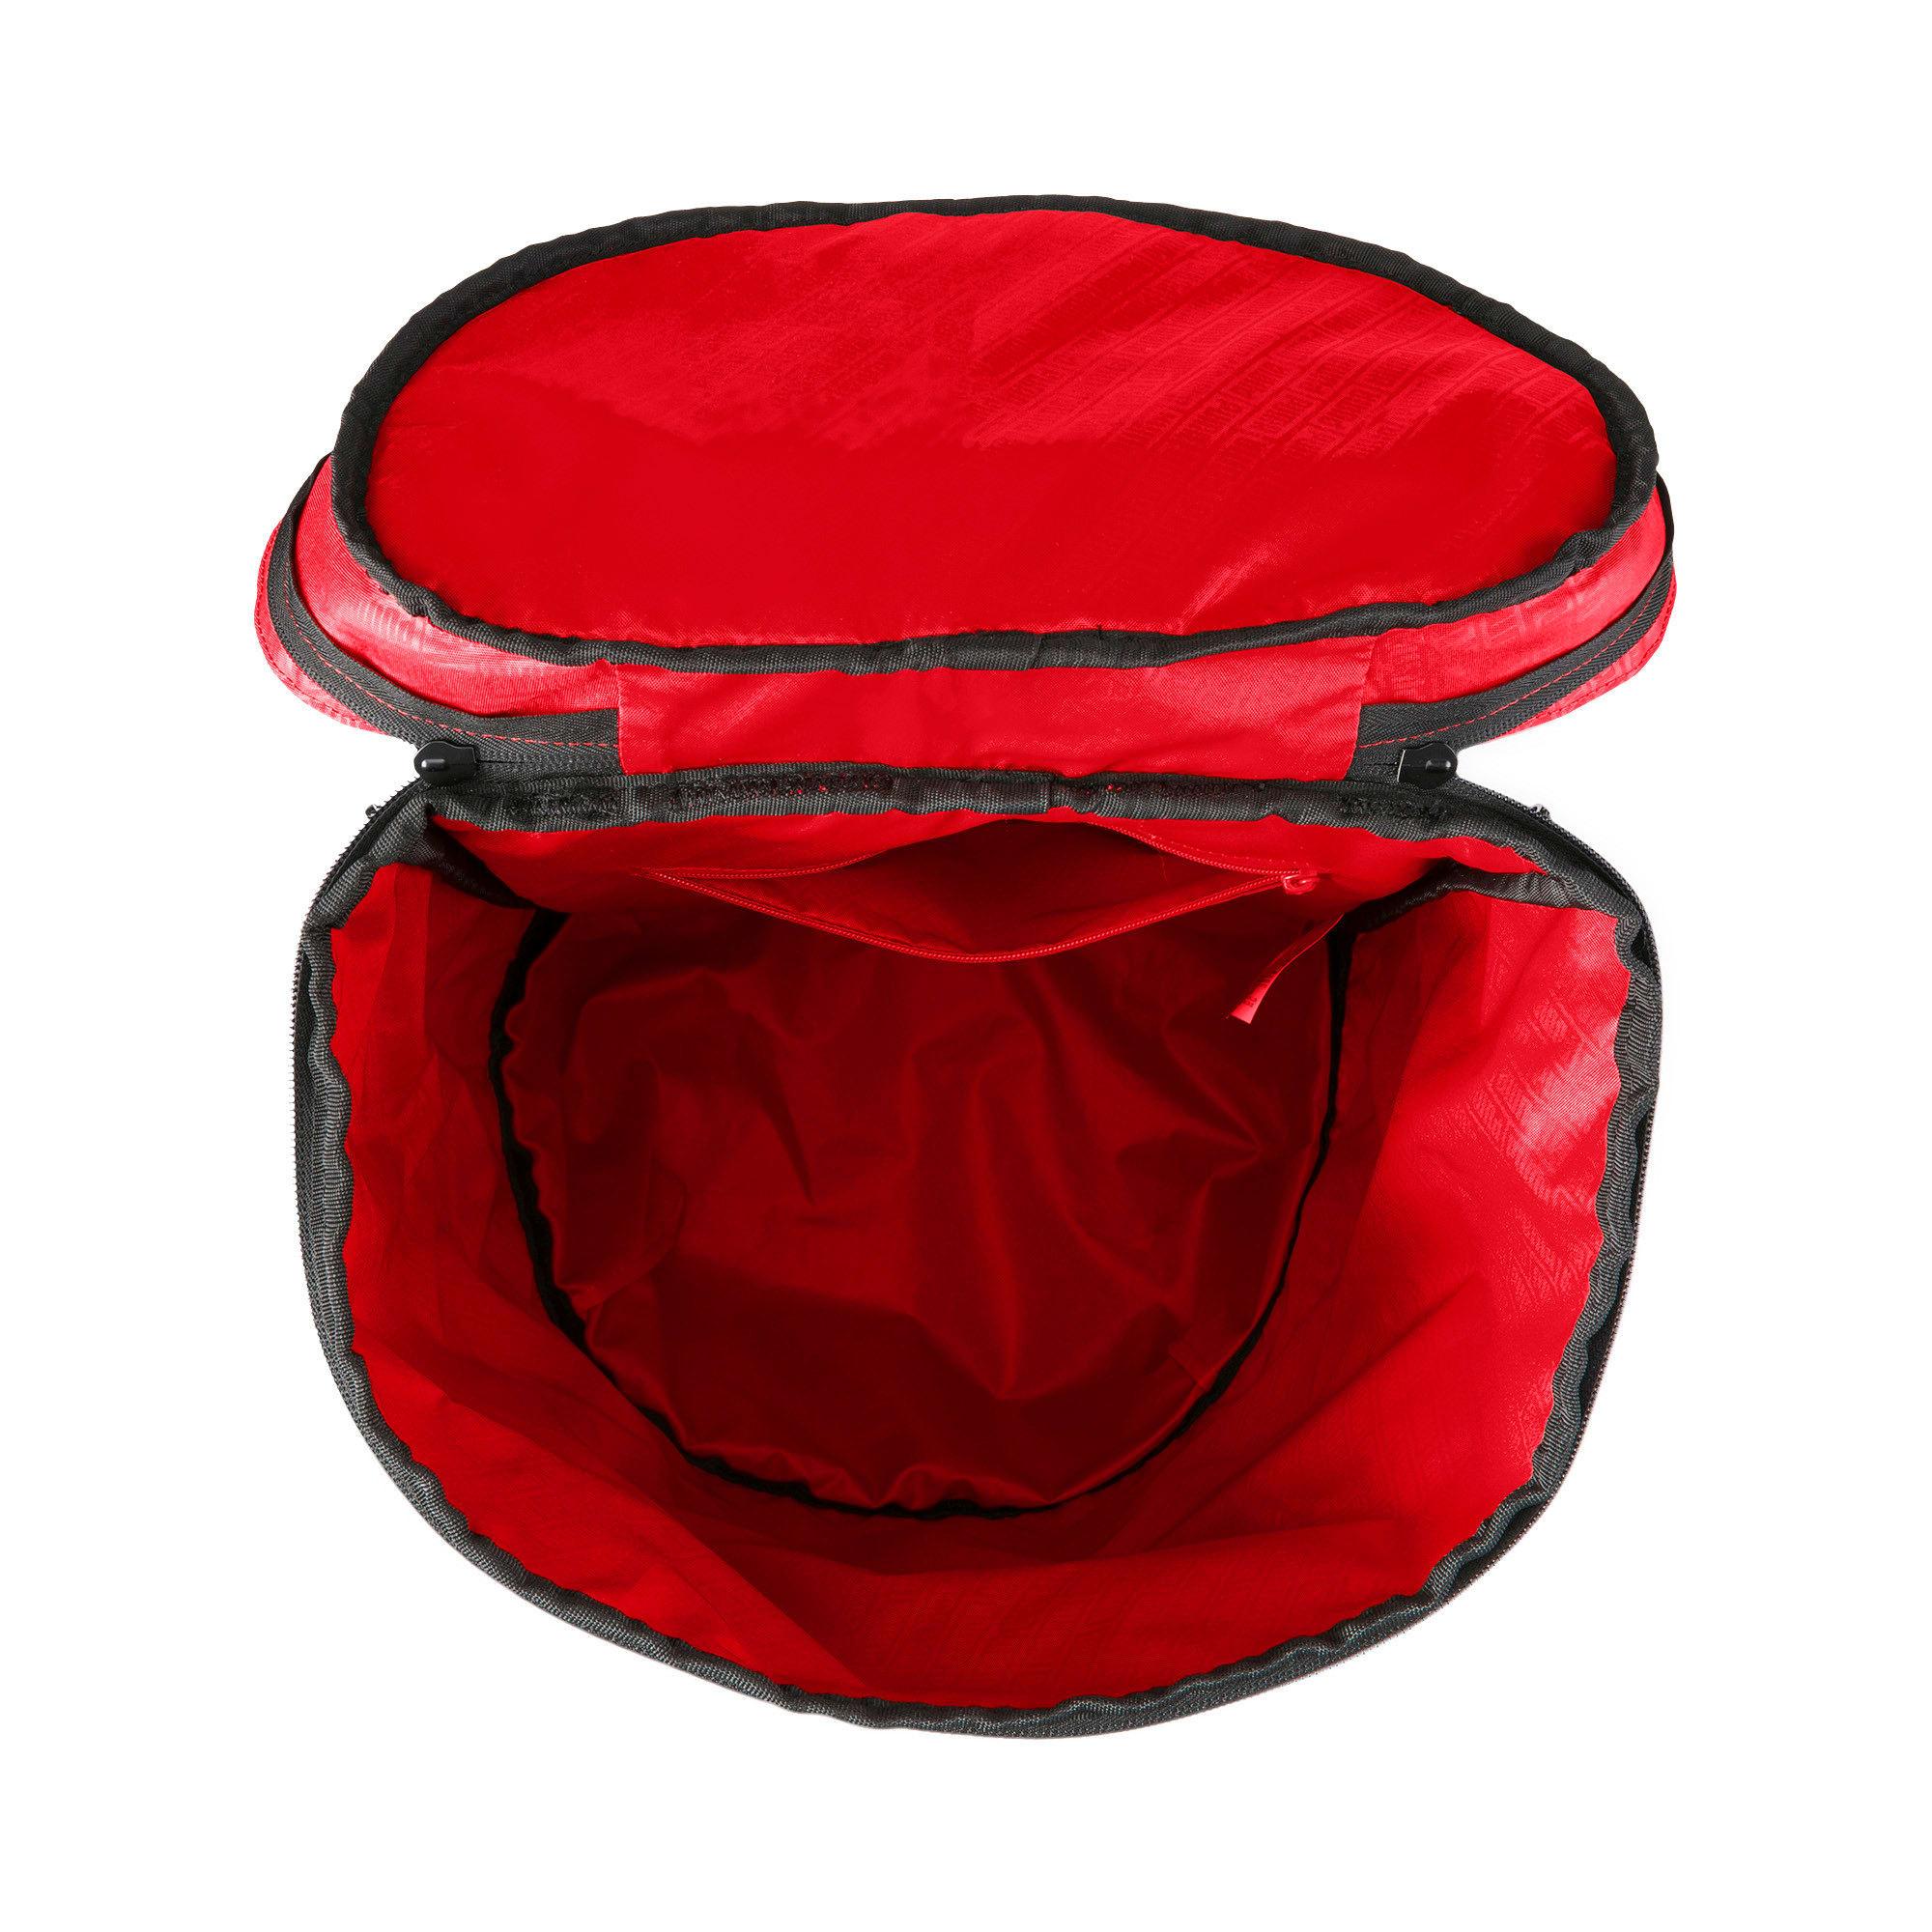 Thumbnail 5 of Scuderia Ferrari Fanwear RCT Backpack, Rosso Corsa, medium